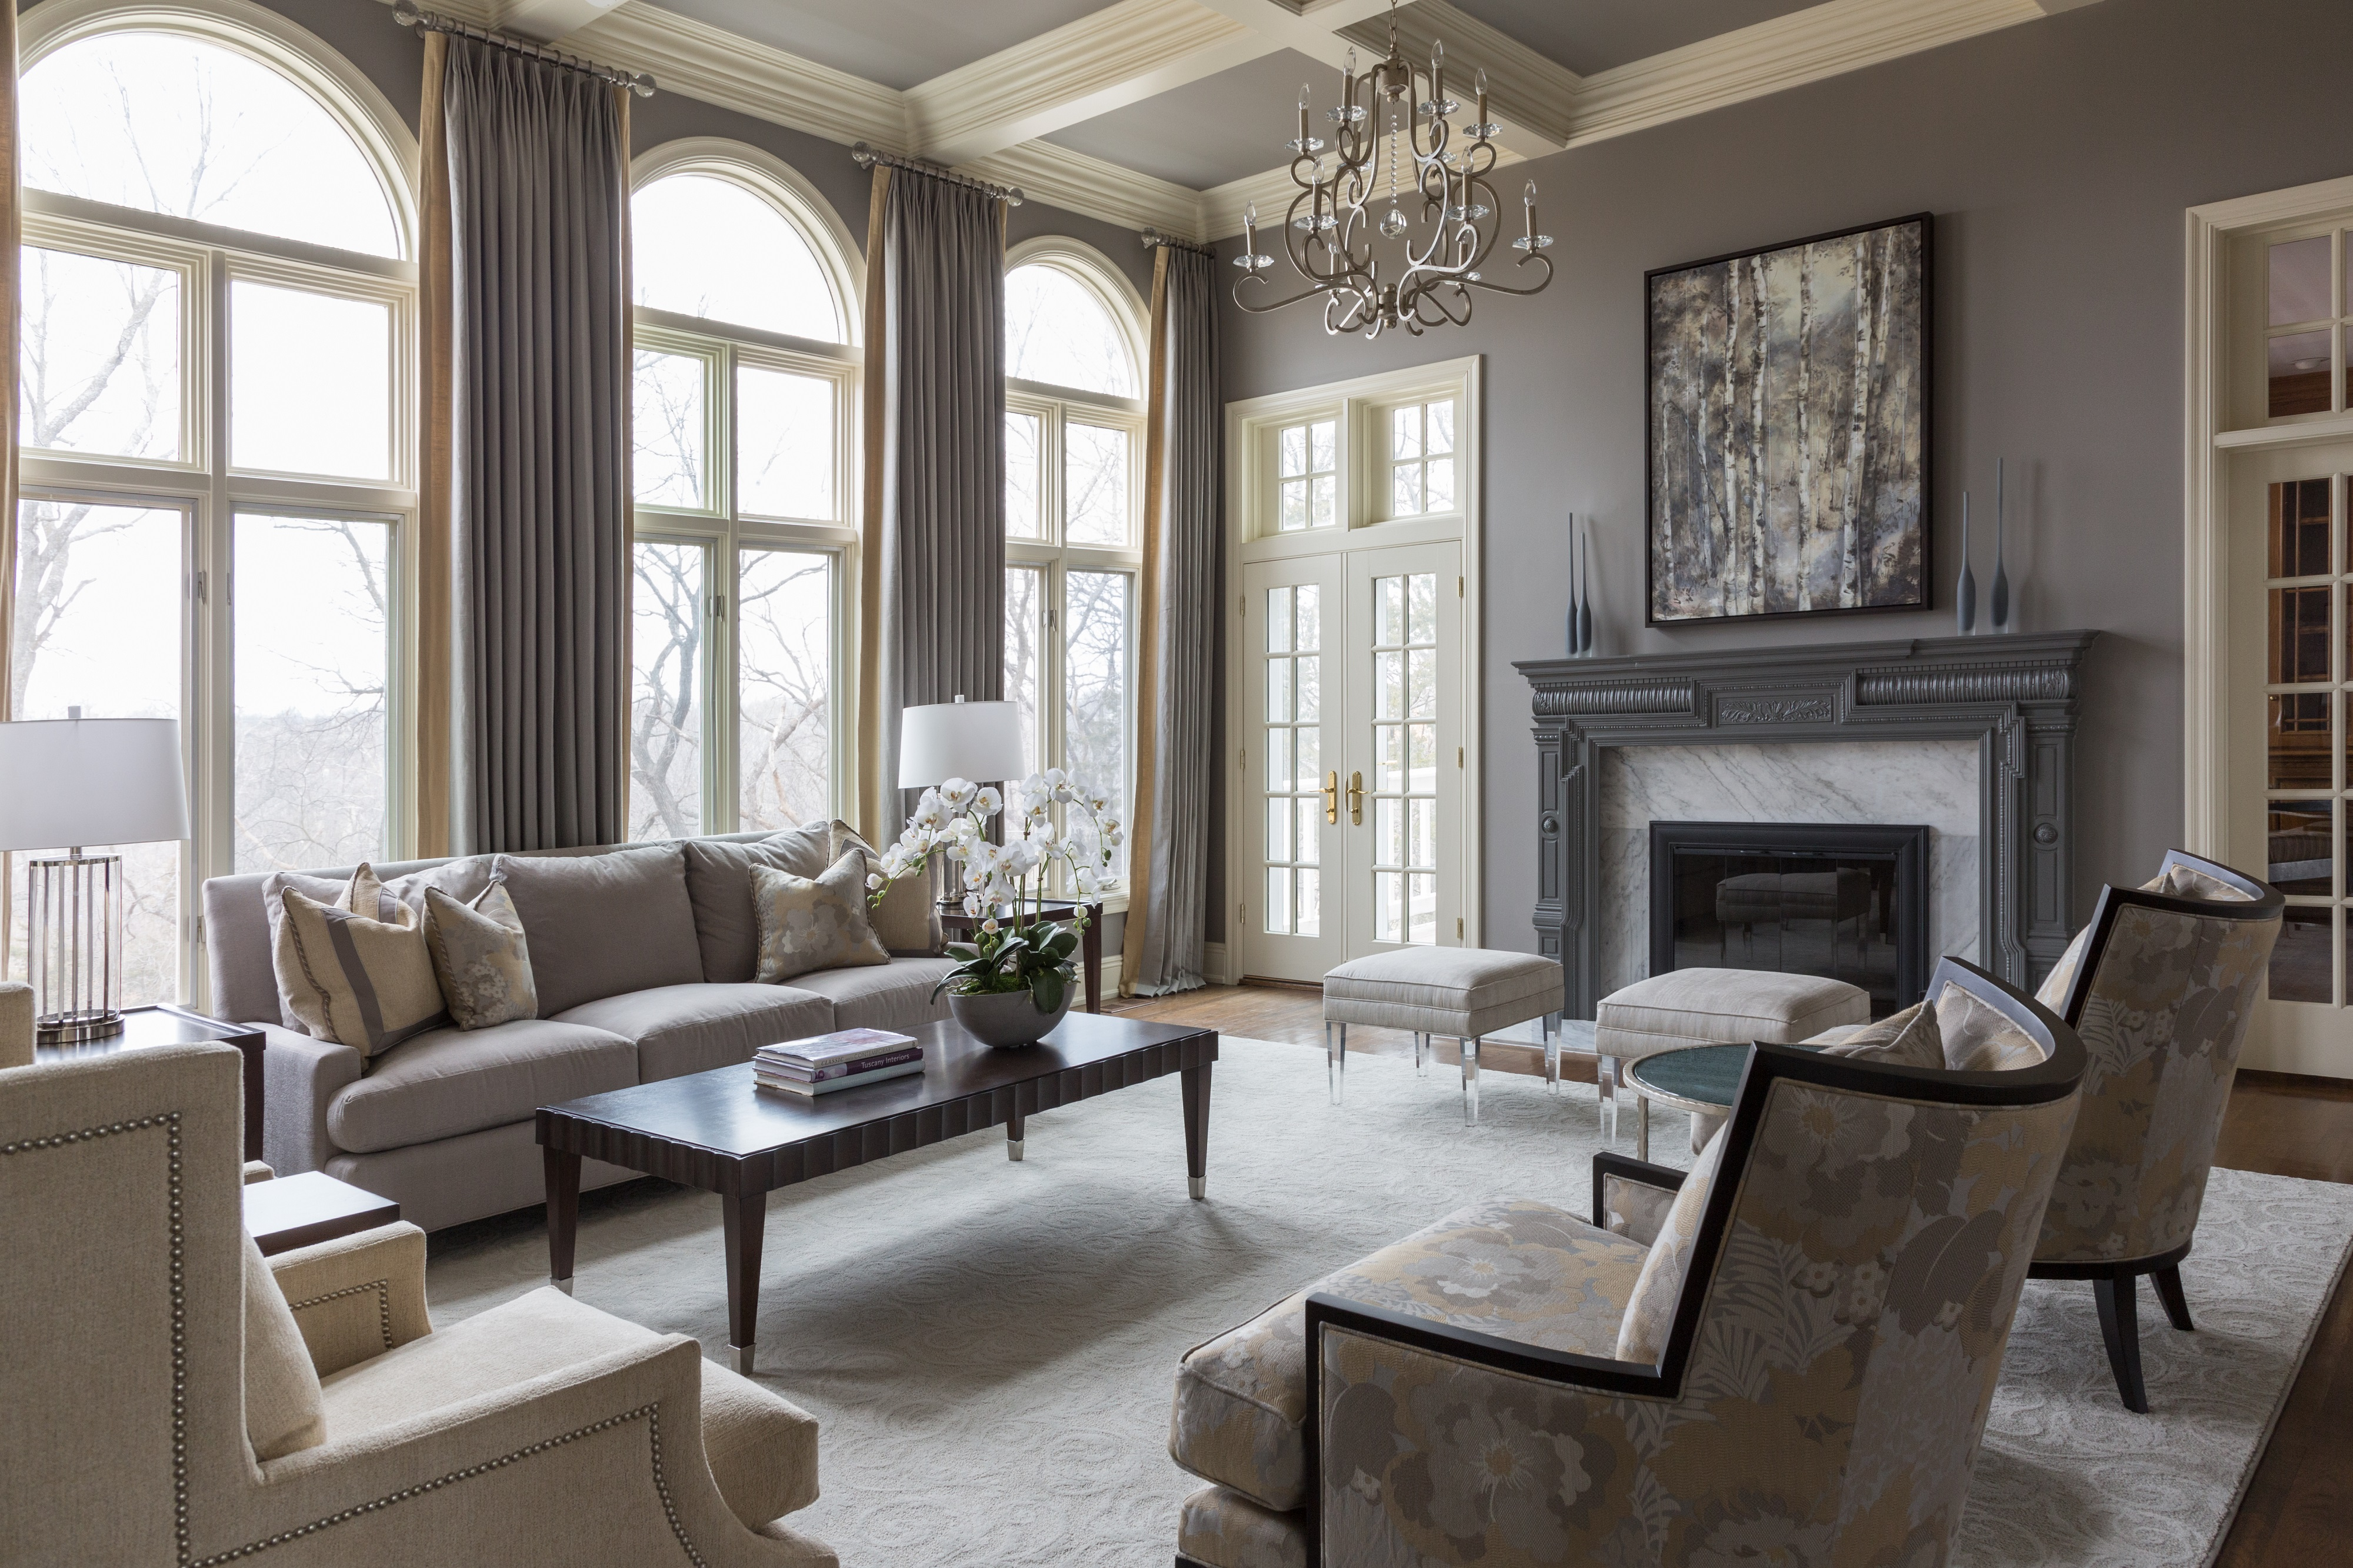 Marvelous Formal Living Room By Arlene Ladegaard Design Connection Inckansas City Centuryfurniture Formal Living Room Ideas 2018 decor Formal Living Room